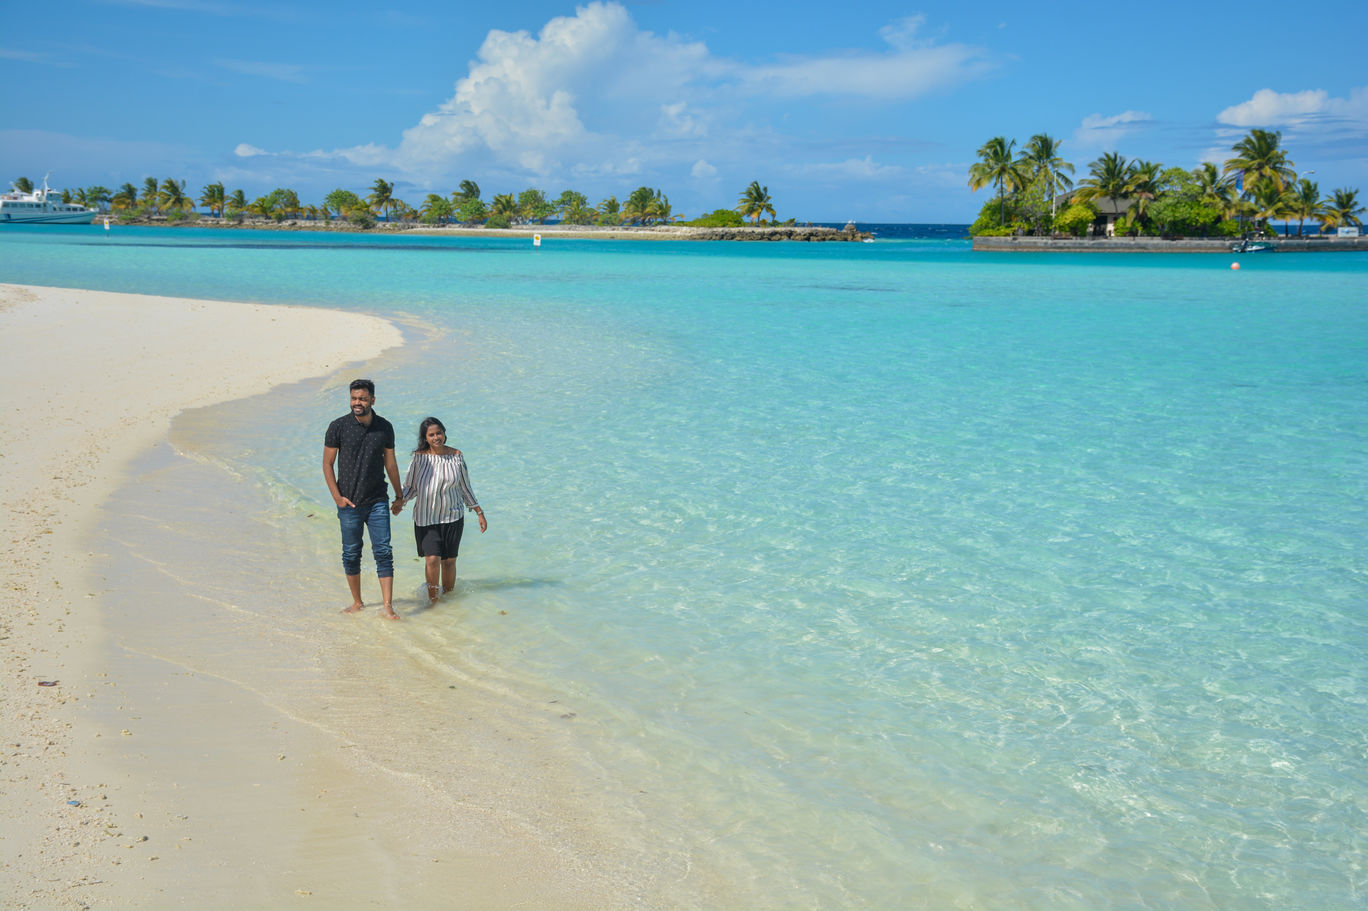 Photo of Maldives By sumanth parakala